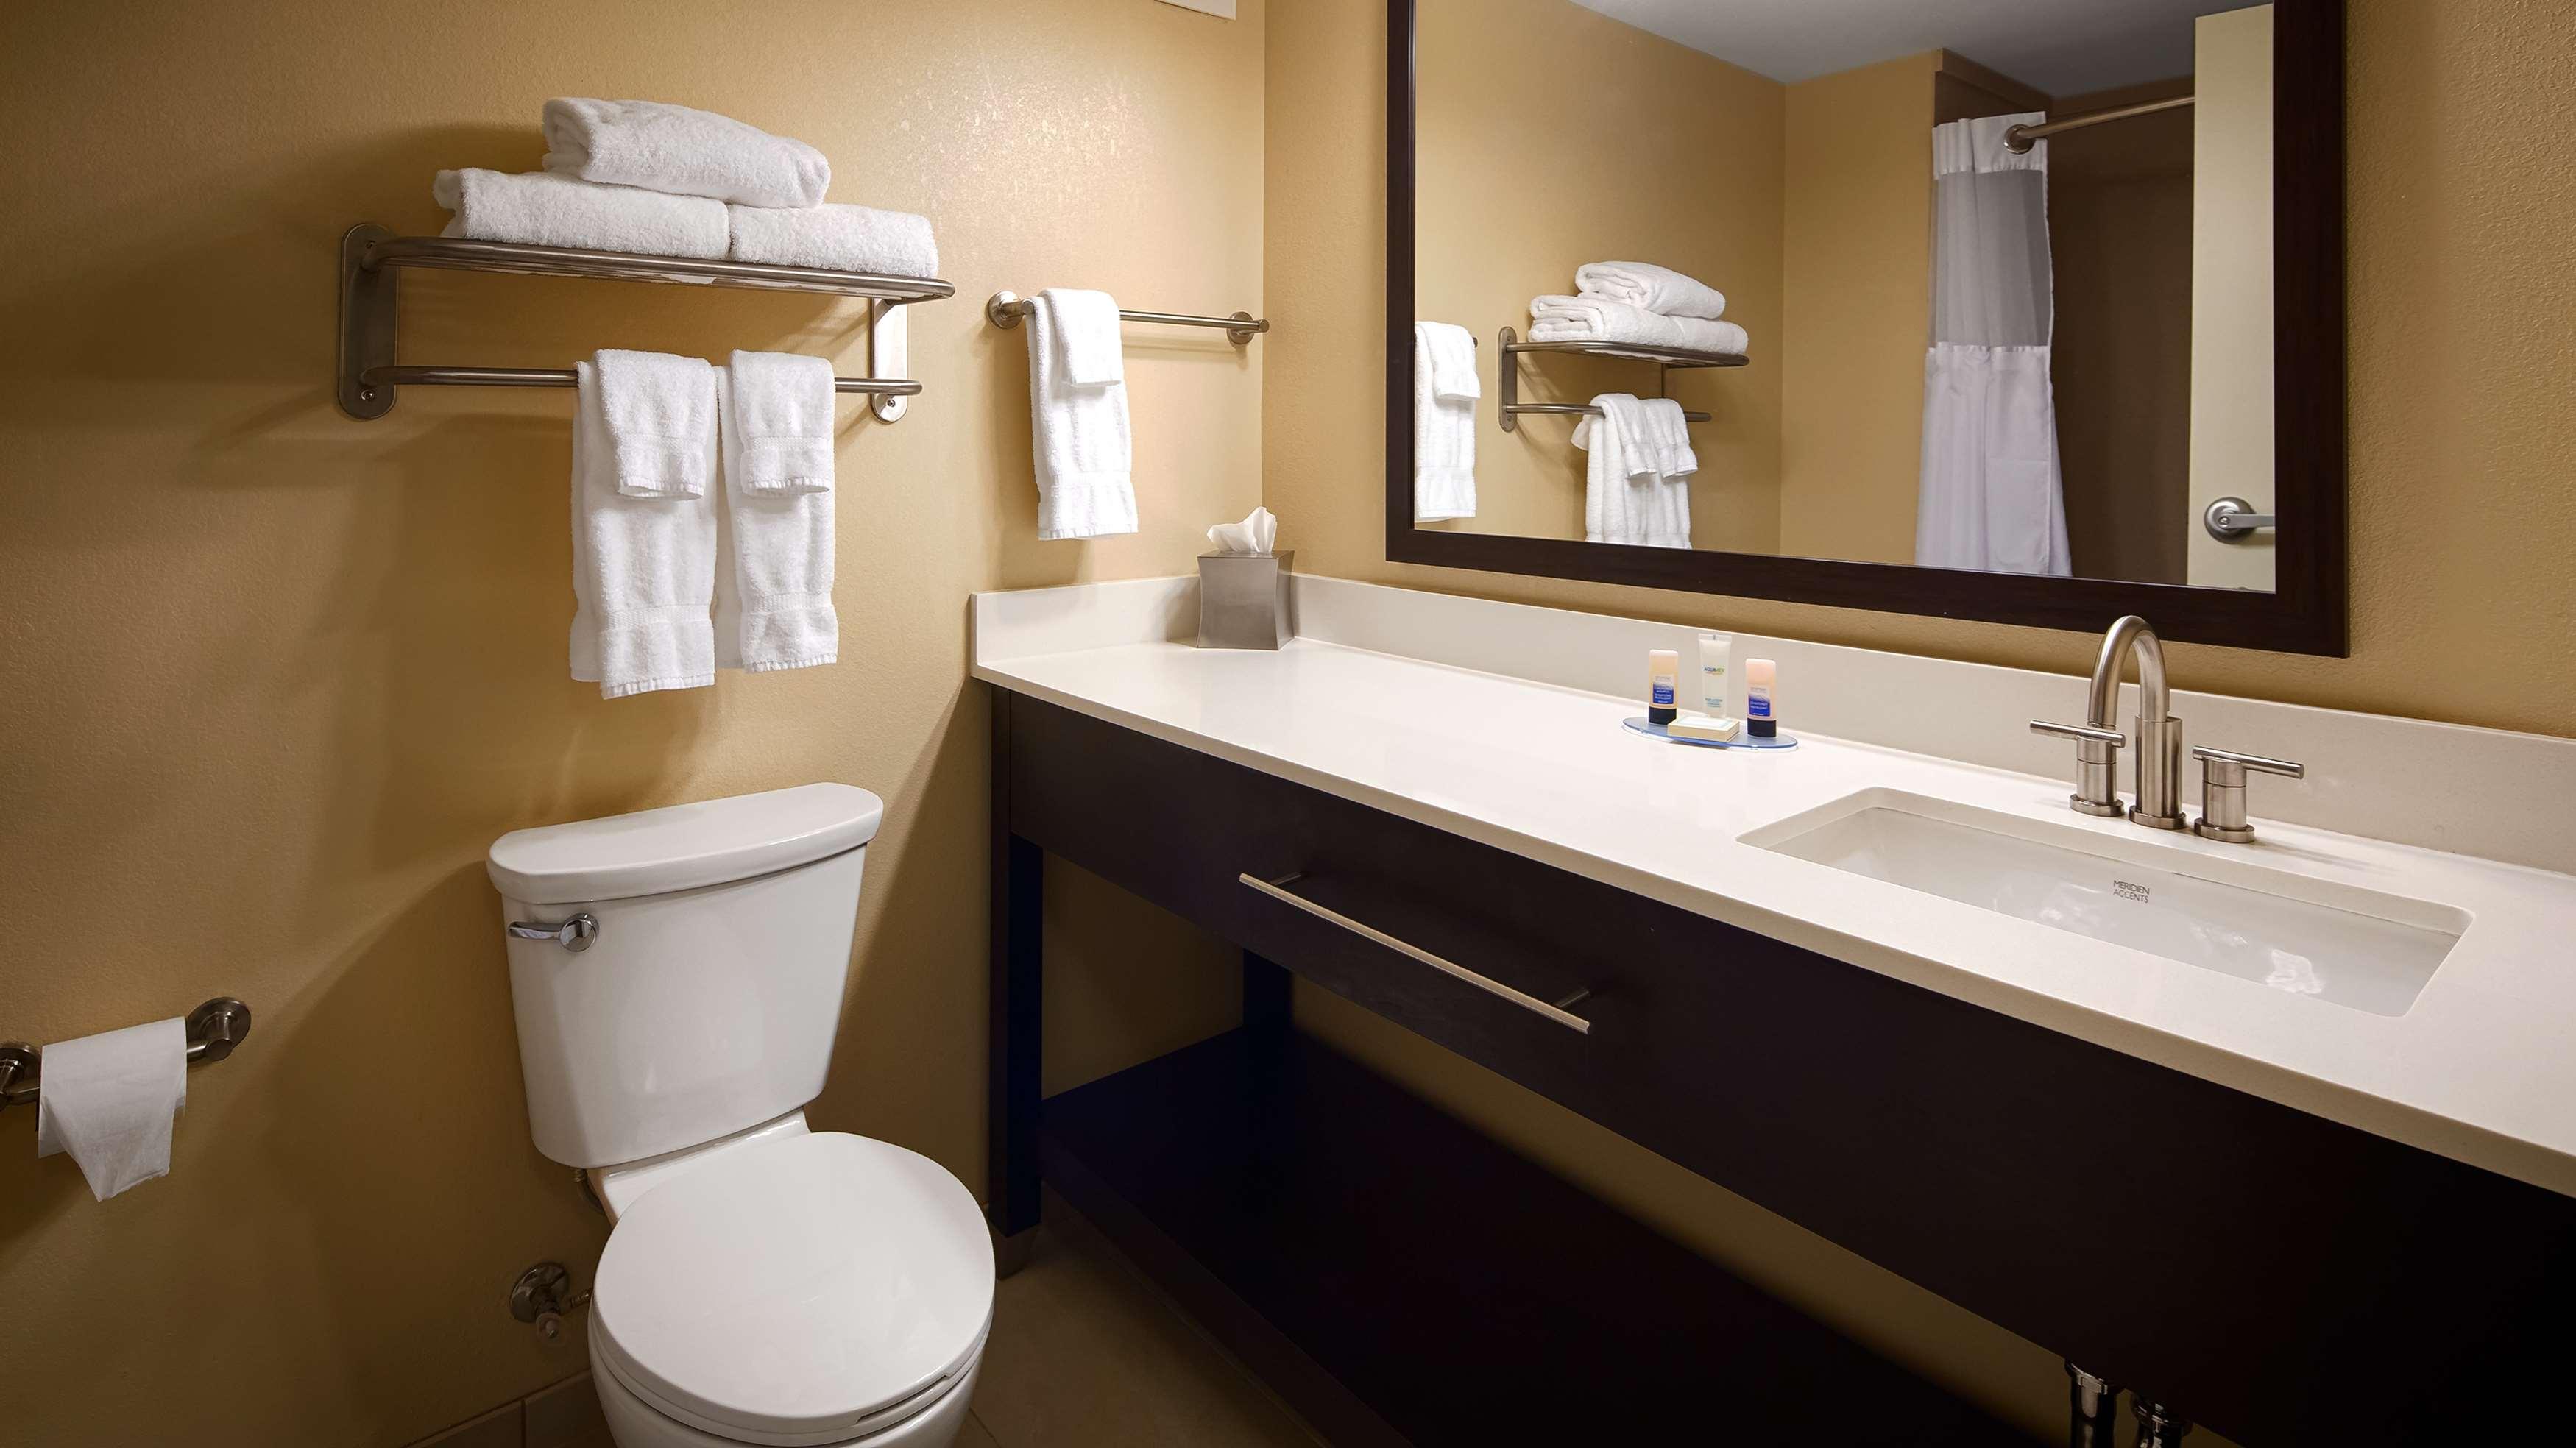 Best Western Plus Thornburg Inn & Suites image 24